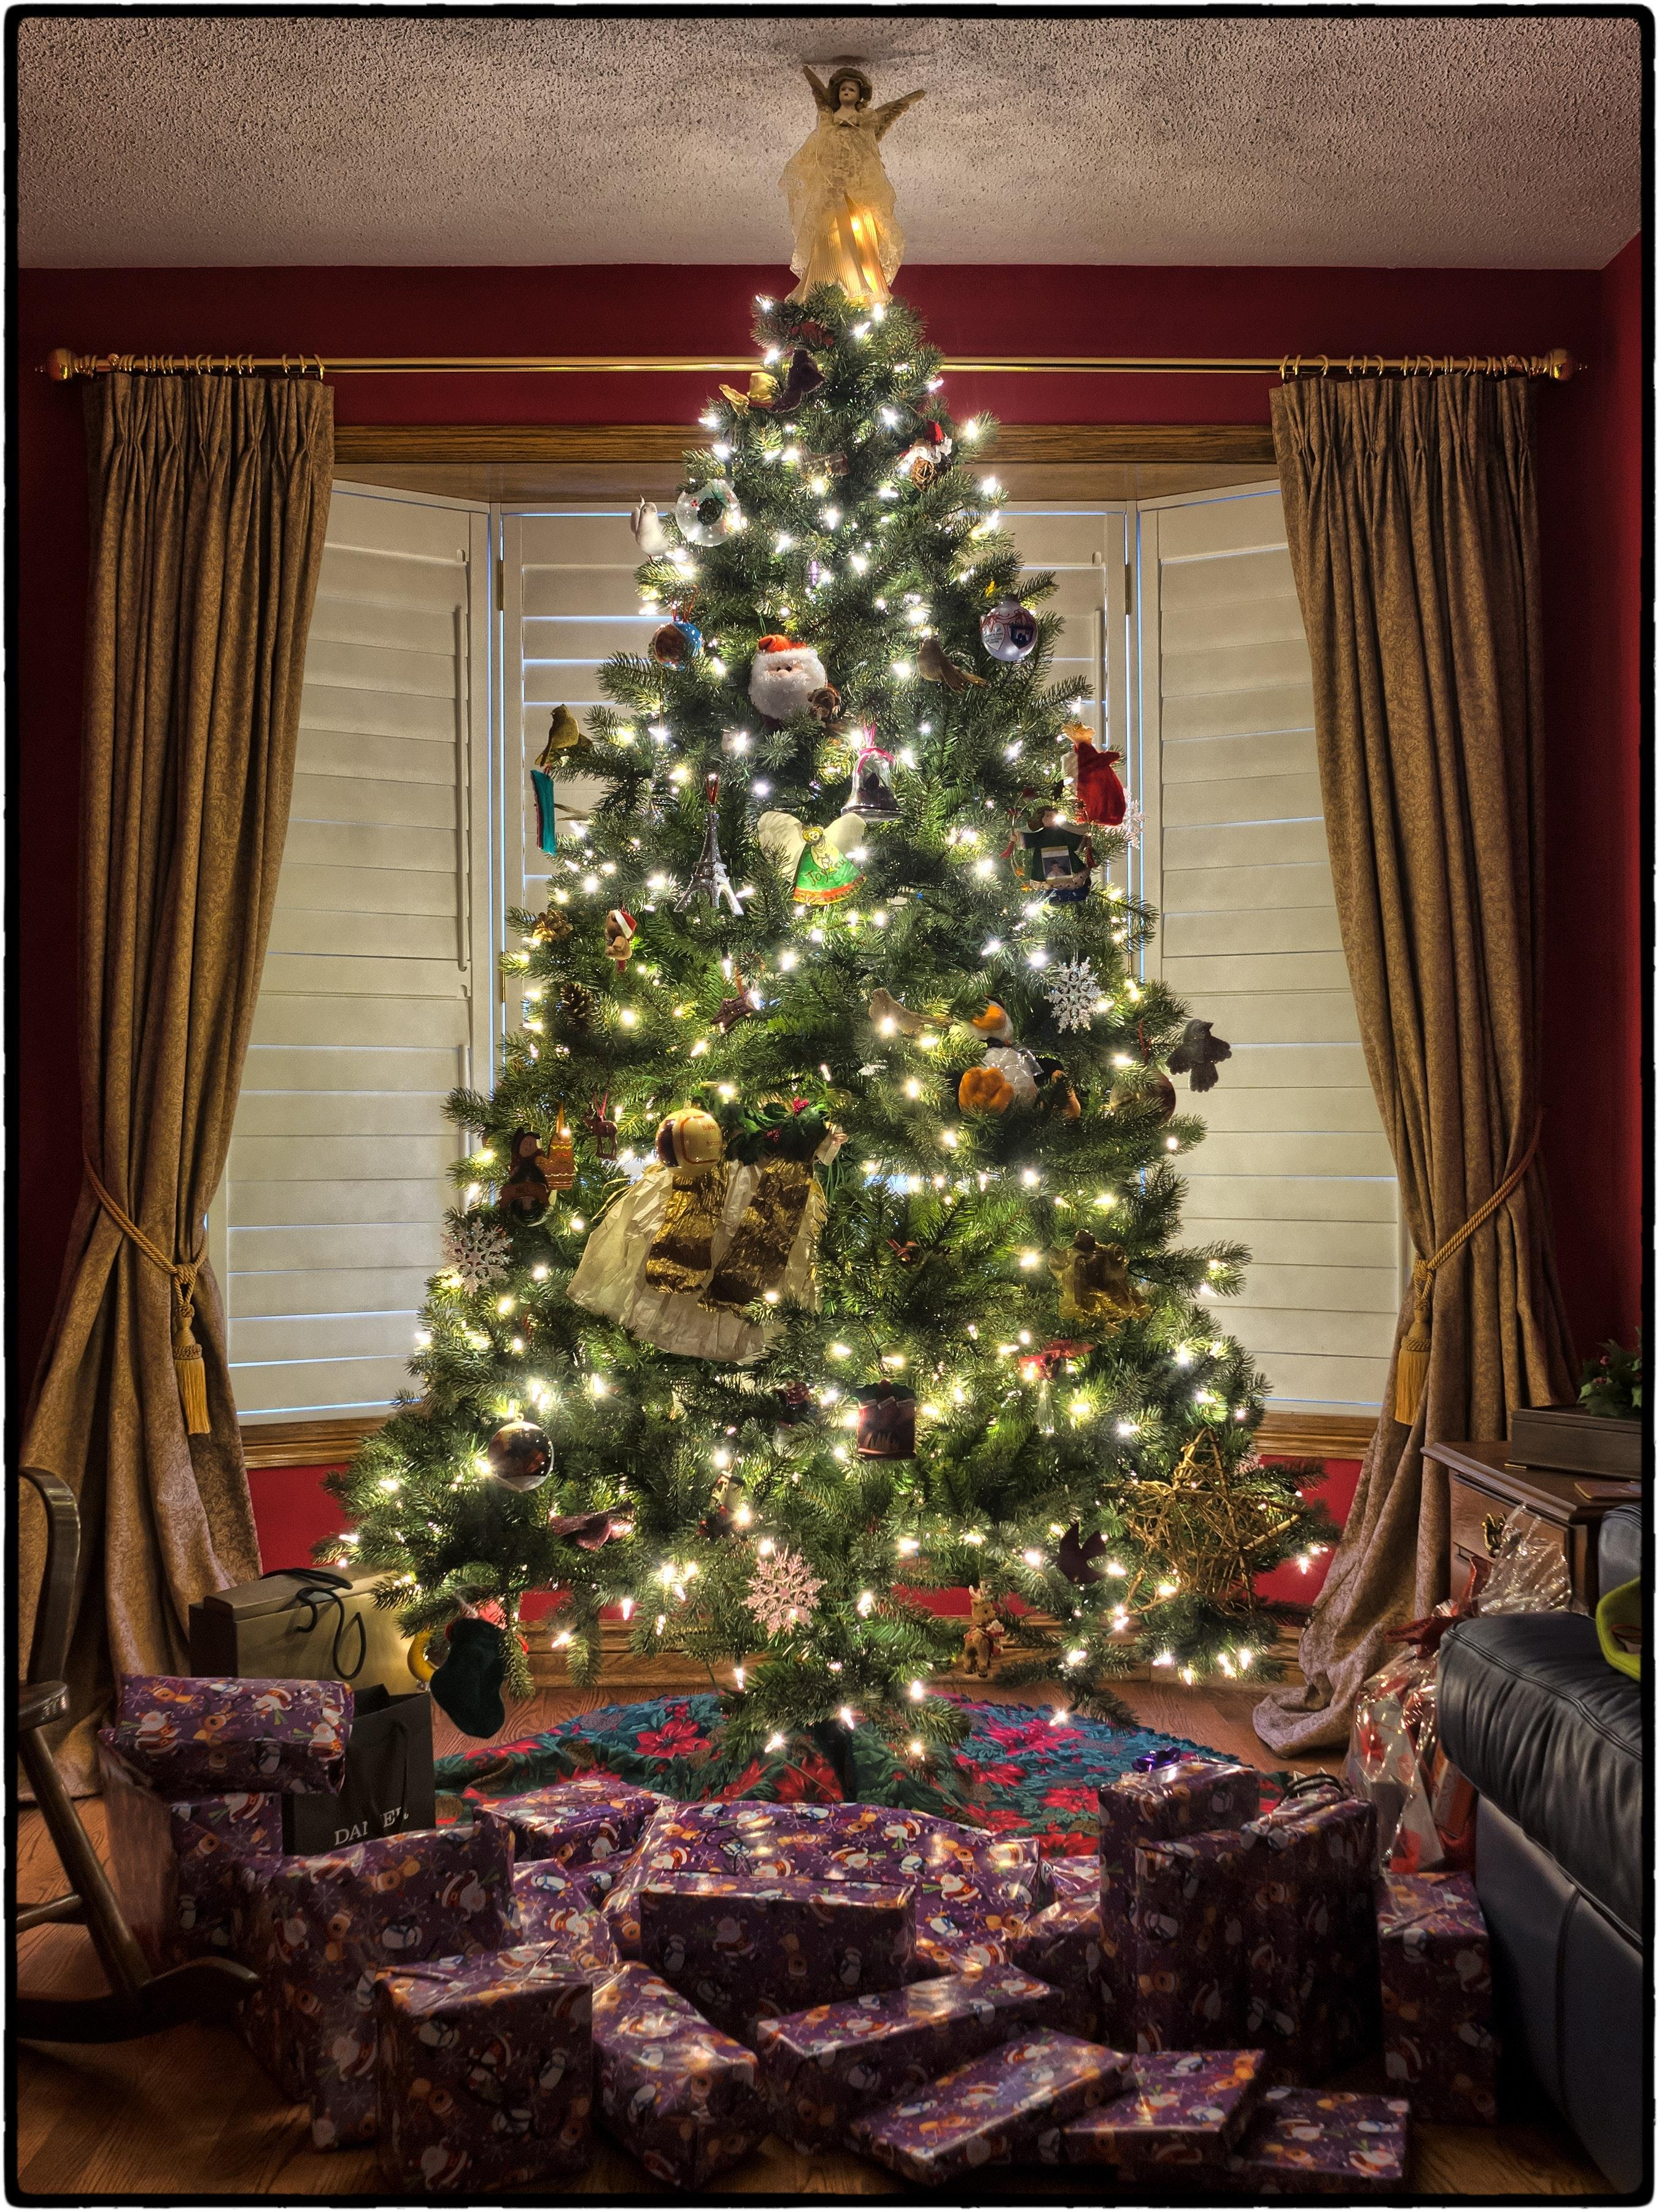 Immagini di Natale bellissime